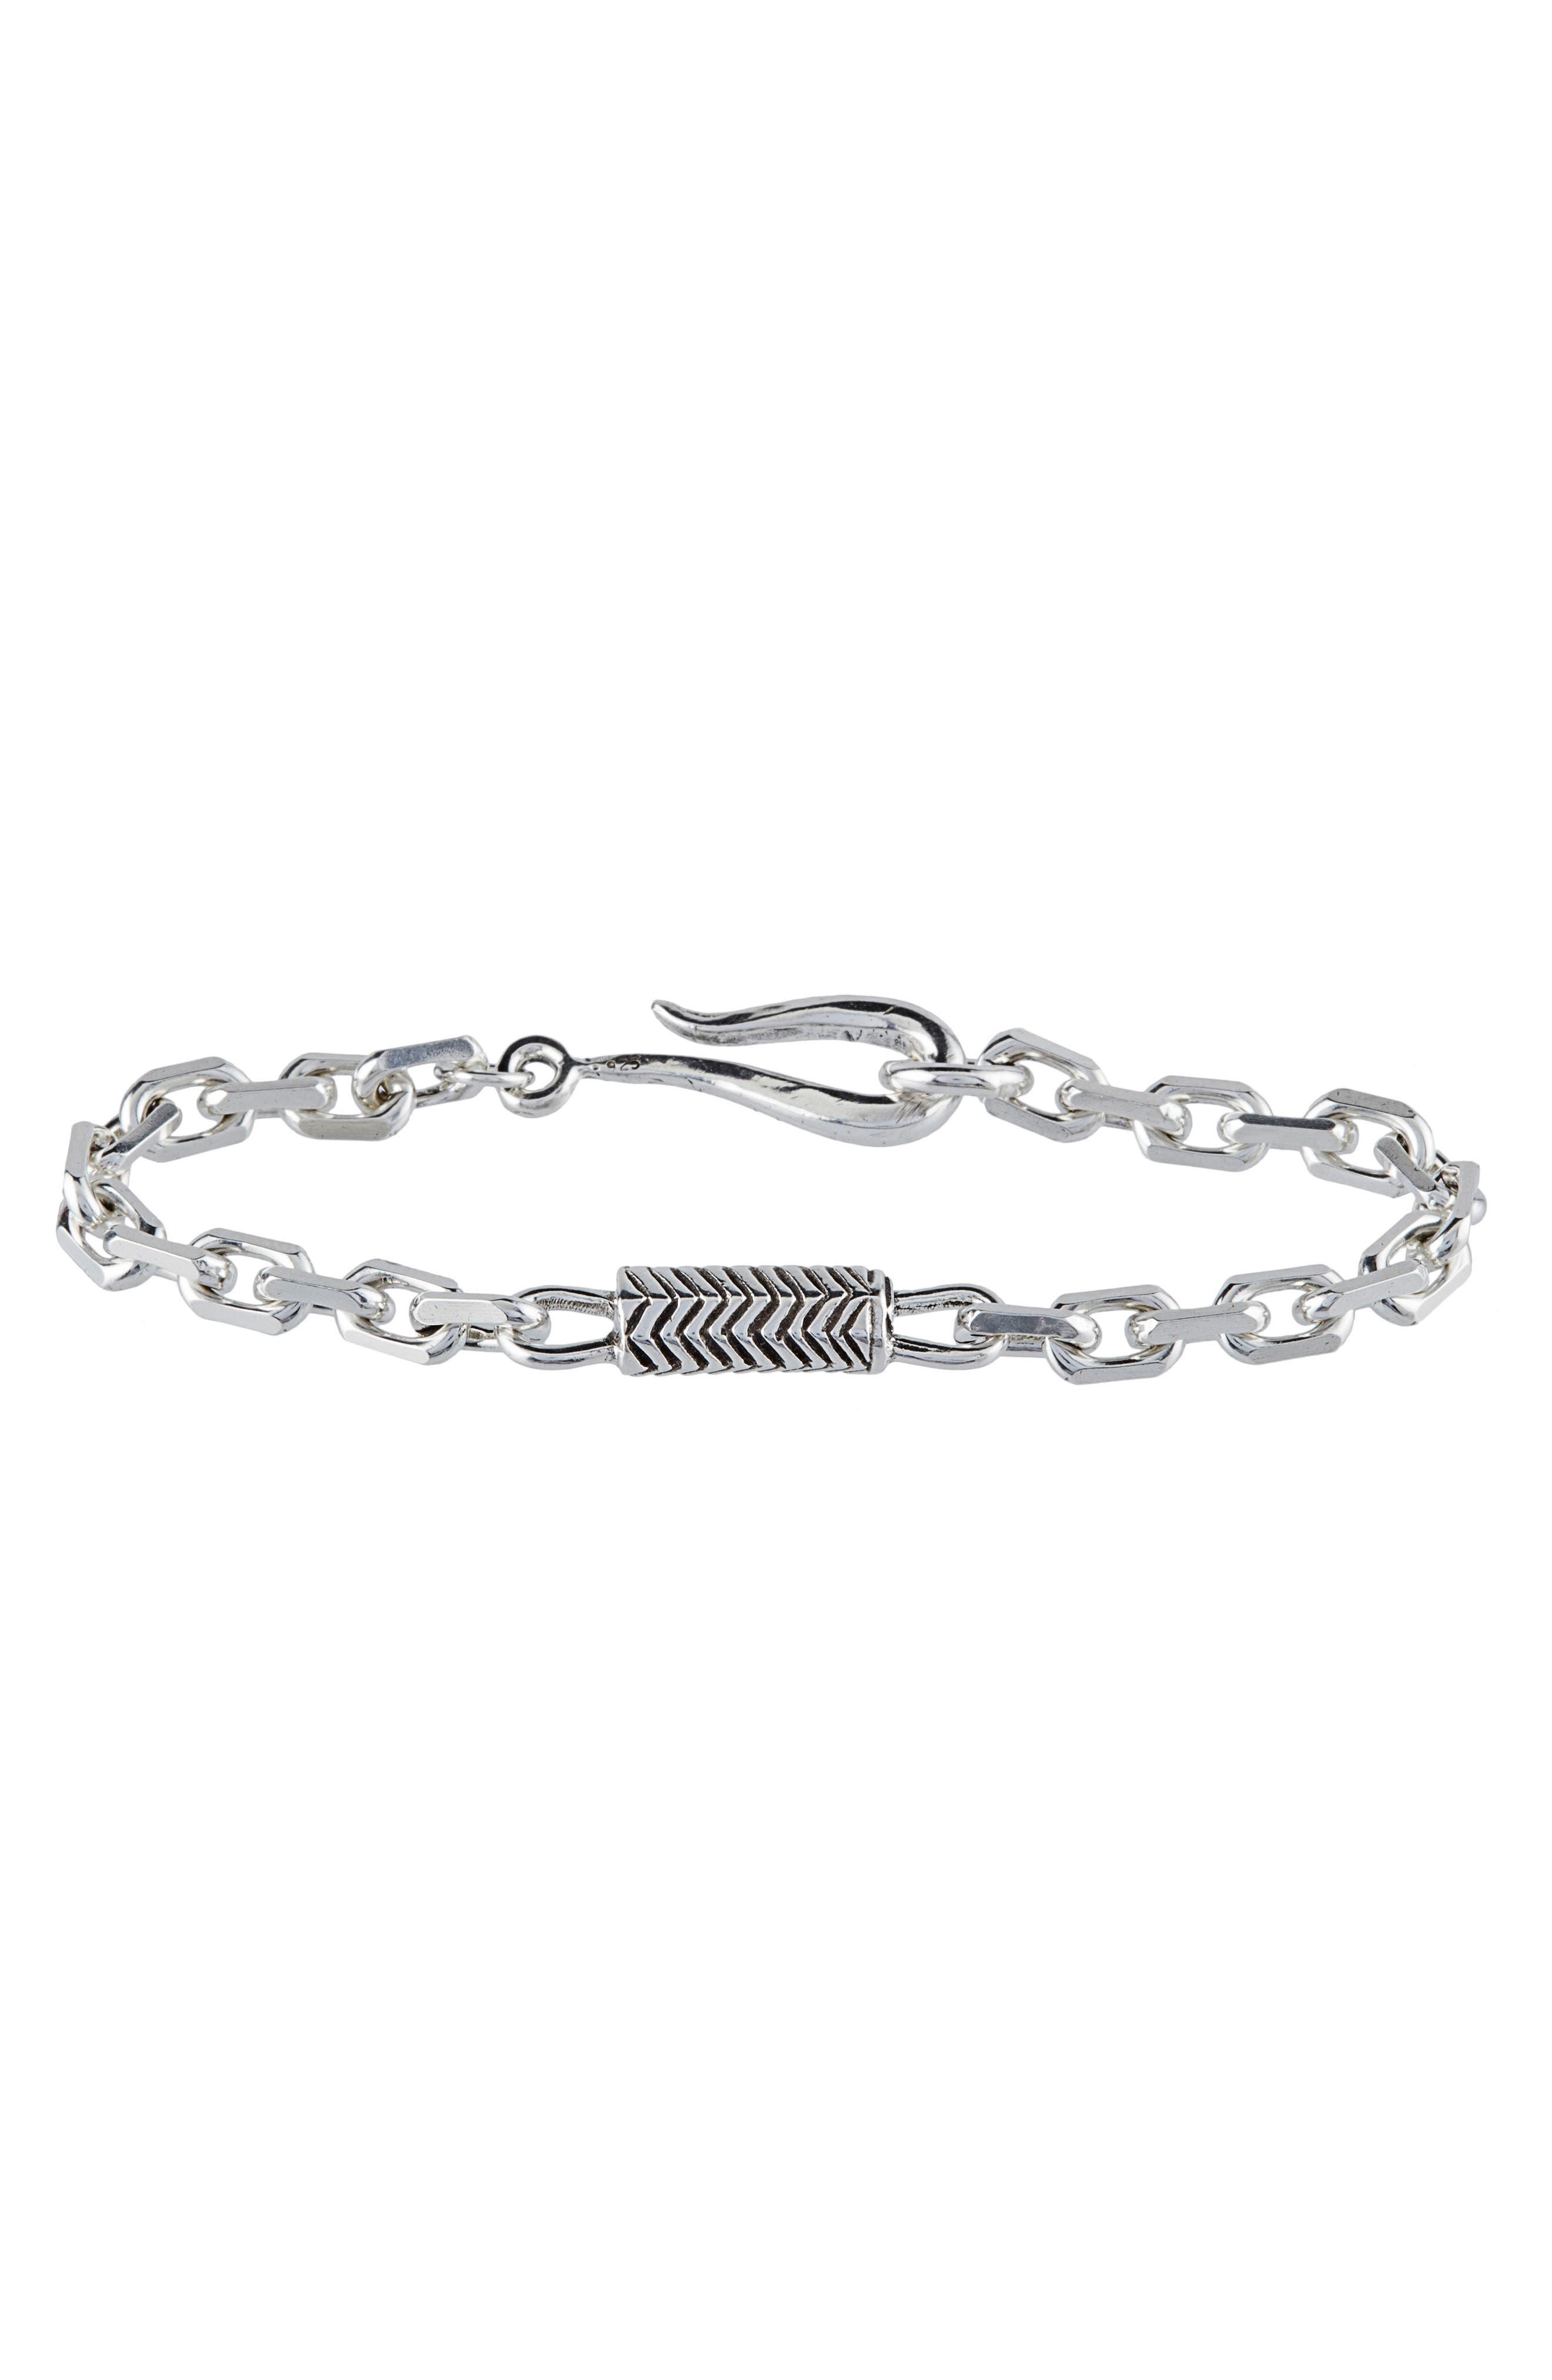 Alternate Image 1 Selected - Lewis Henry Nicholas Hiapo Chain Bracelet